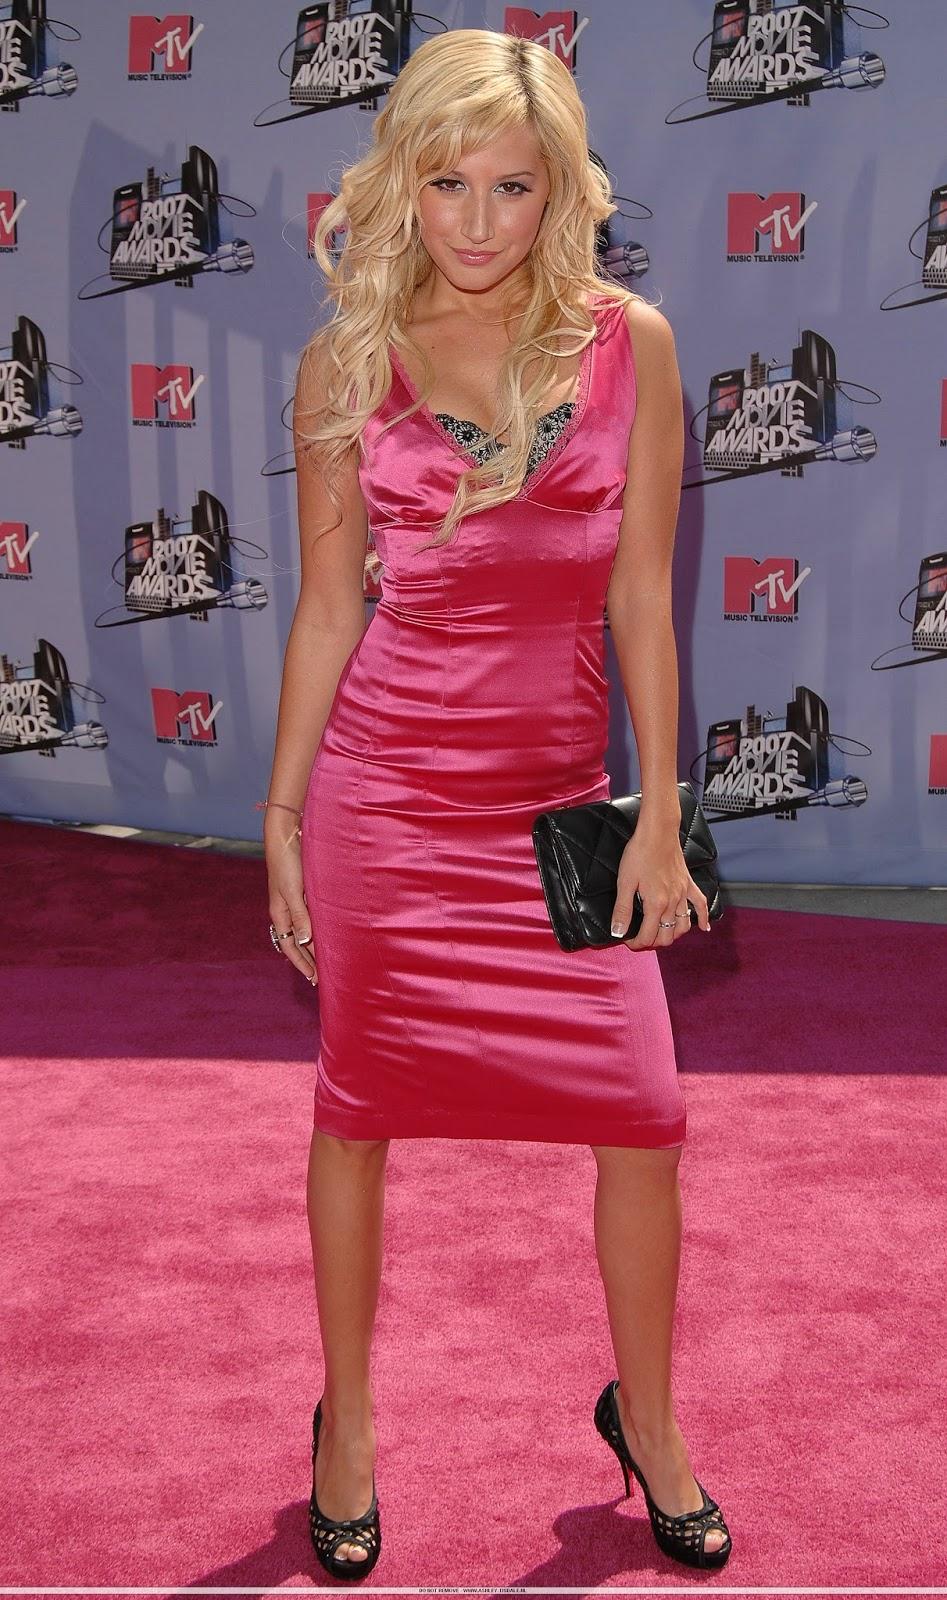 Ashley Pink Nude Photos 6